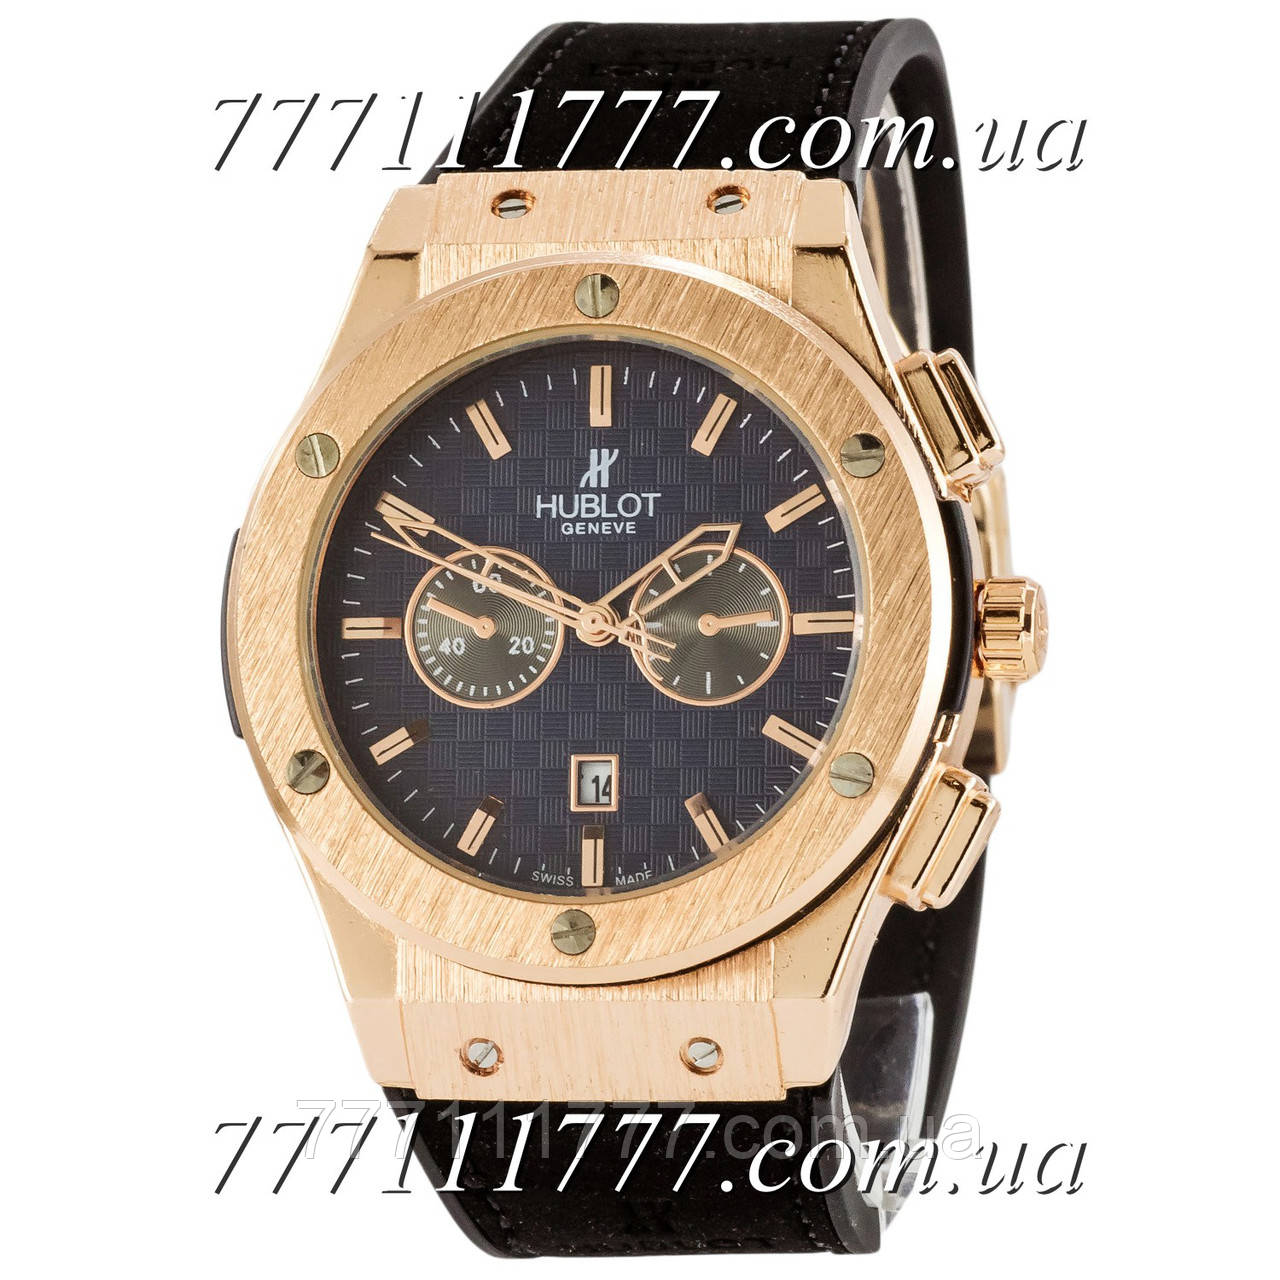 74ebf273ca4a Часы мужские наручные Hublot 882888 Classic Fusion Black-Gold-Black ...